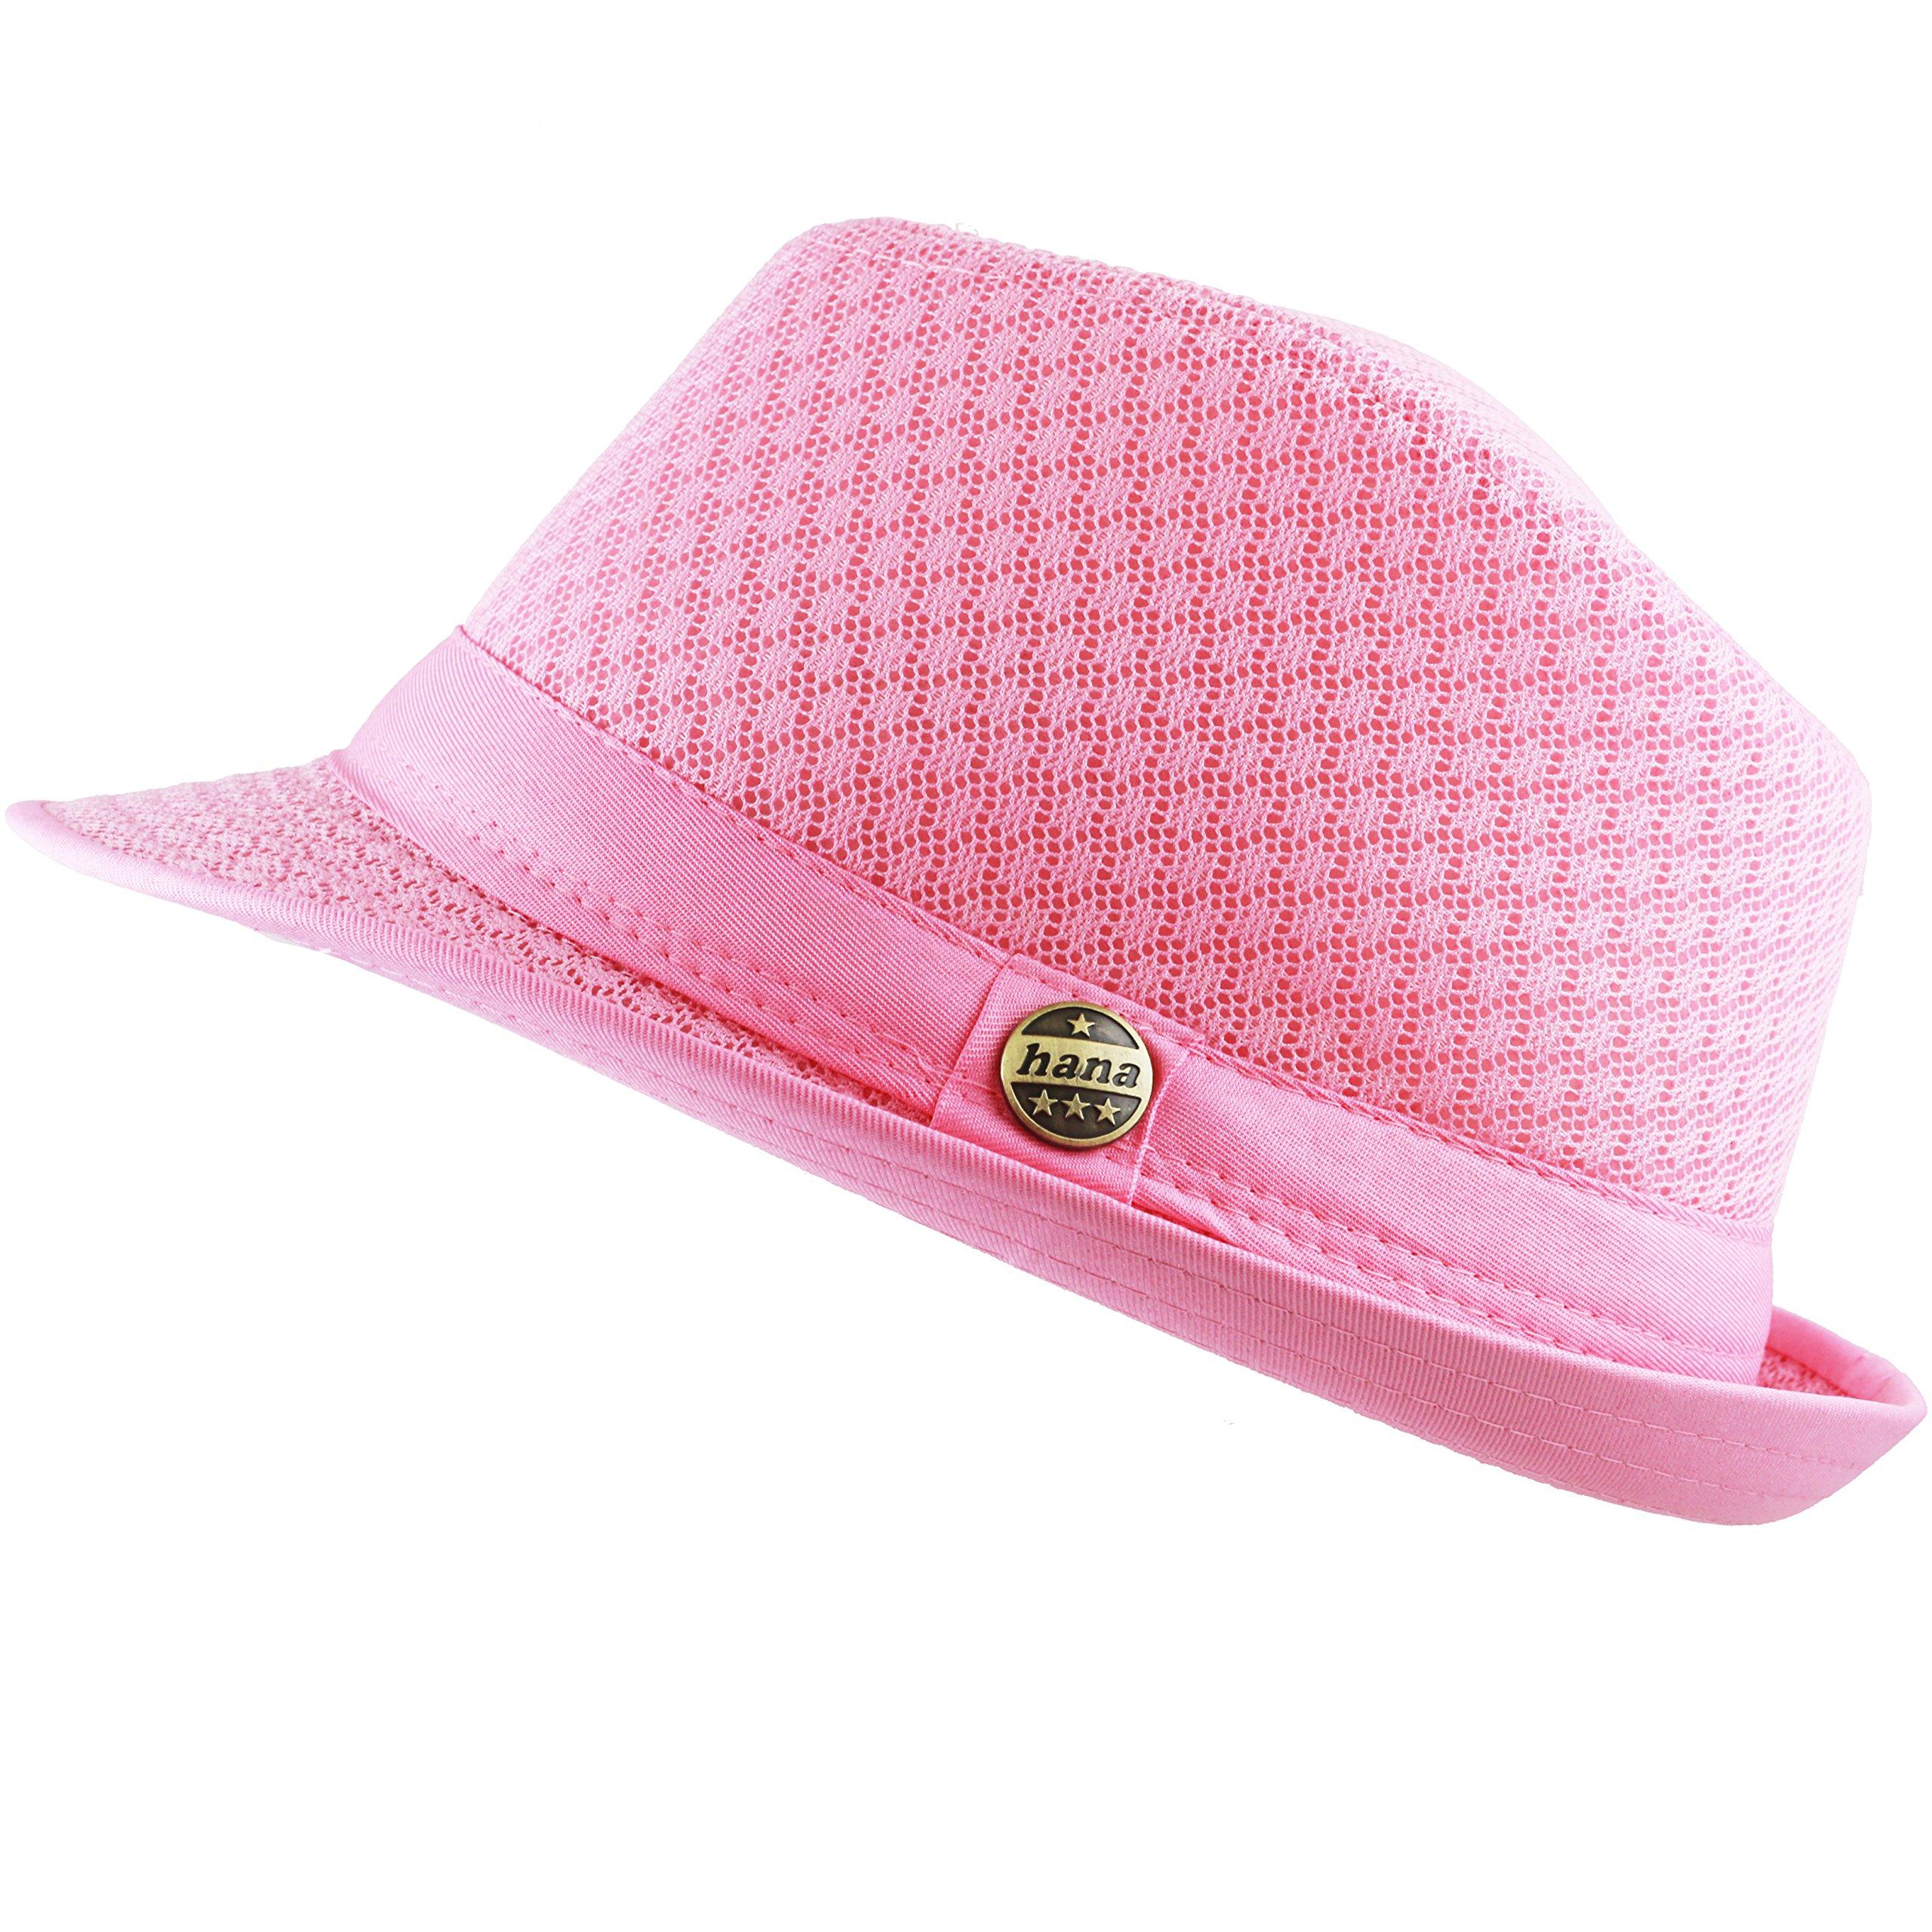 THE HAT DEPOT 200G1015 Light Weight Classic Soft Cool Mesh Fedora hat (L/XL, Lt. Pink)